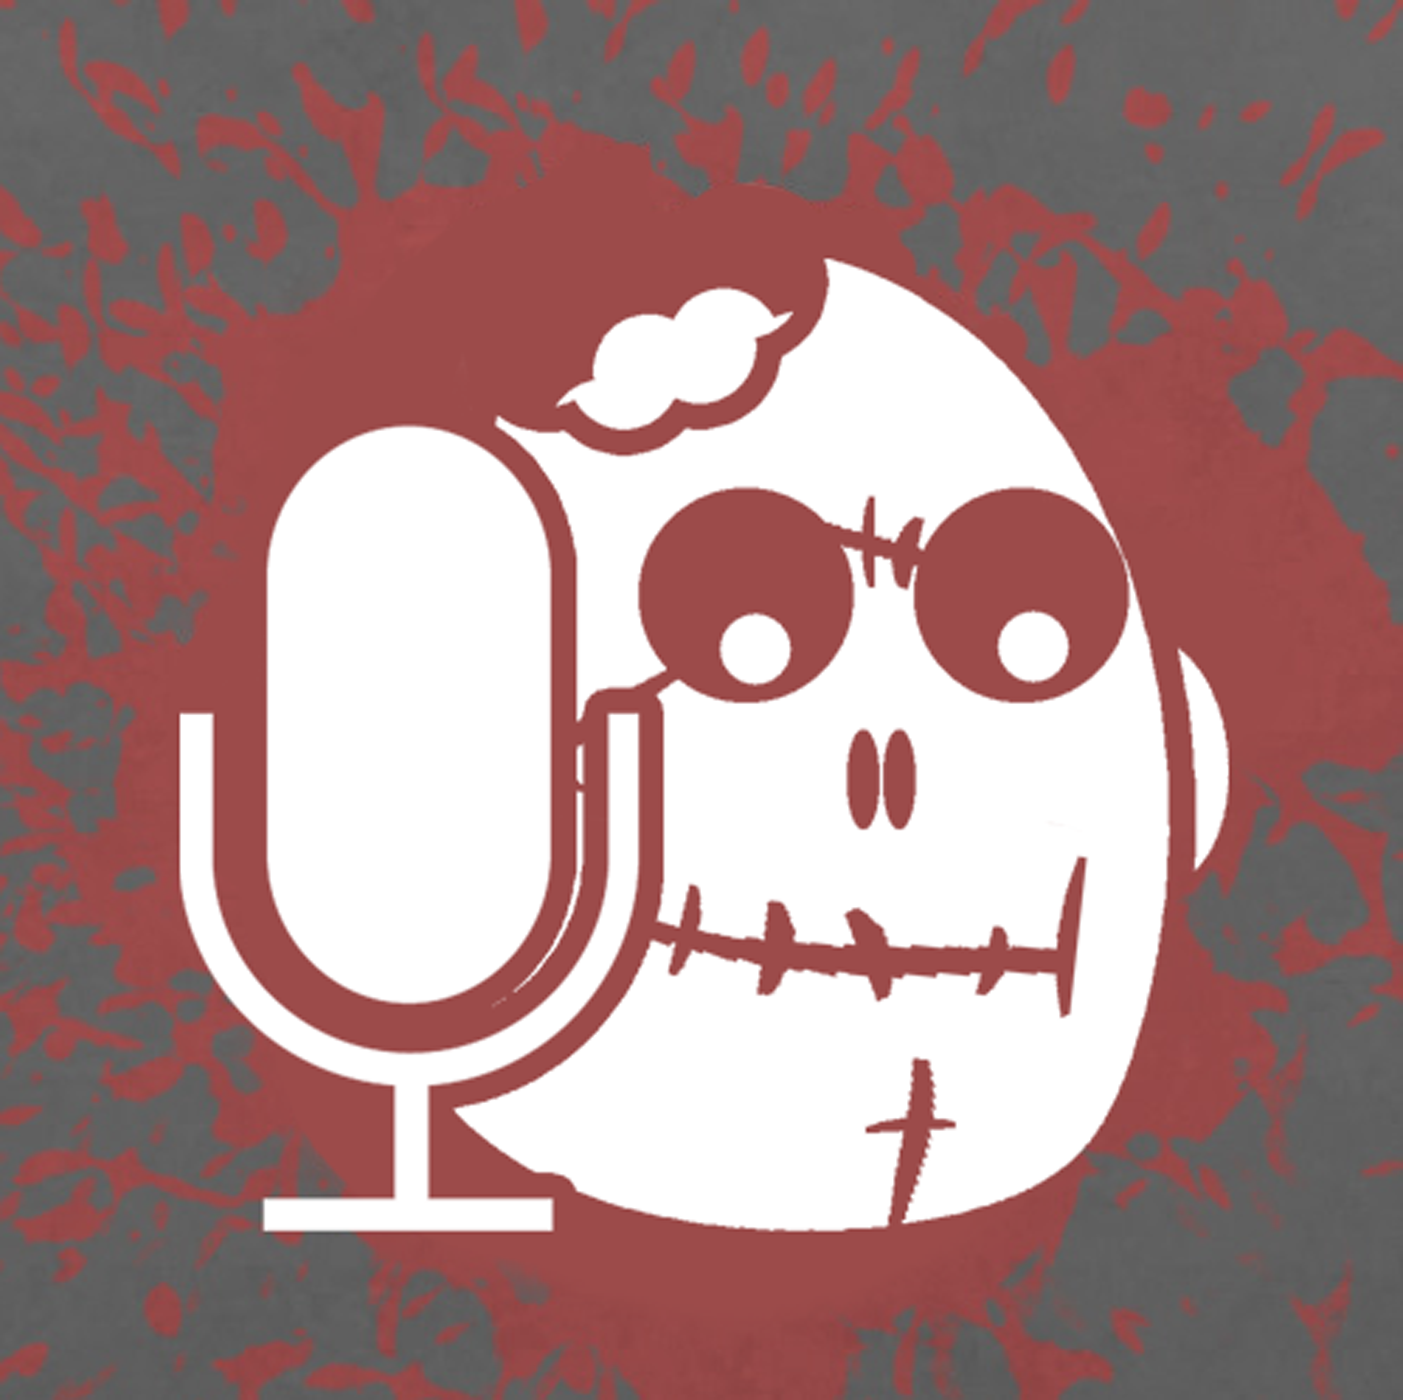 Horrorish.com Podcast